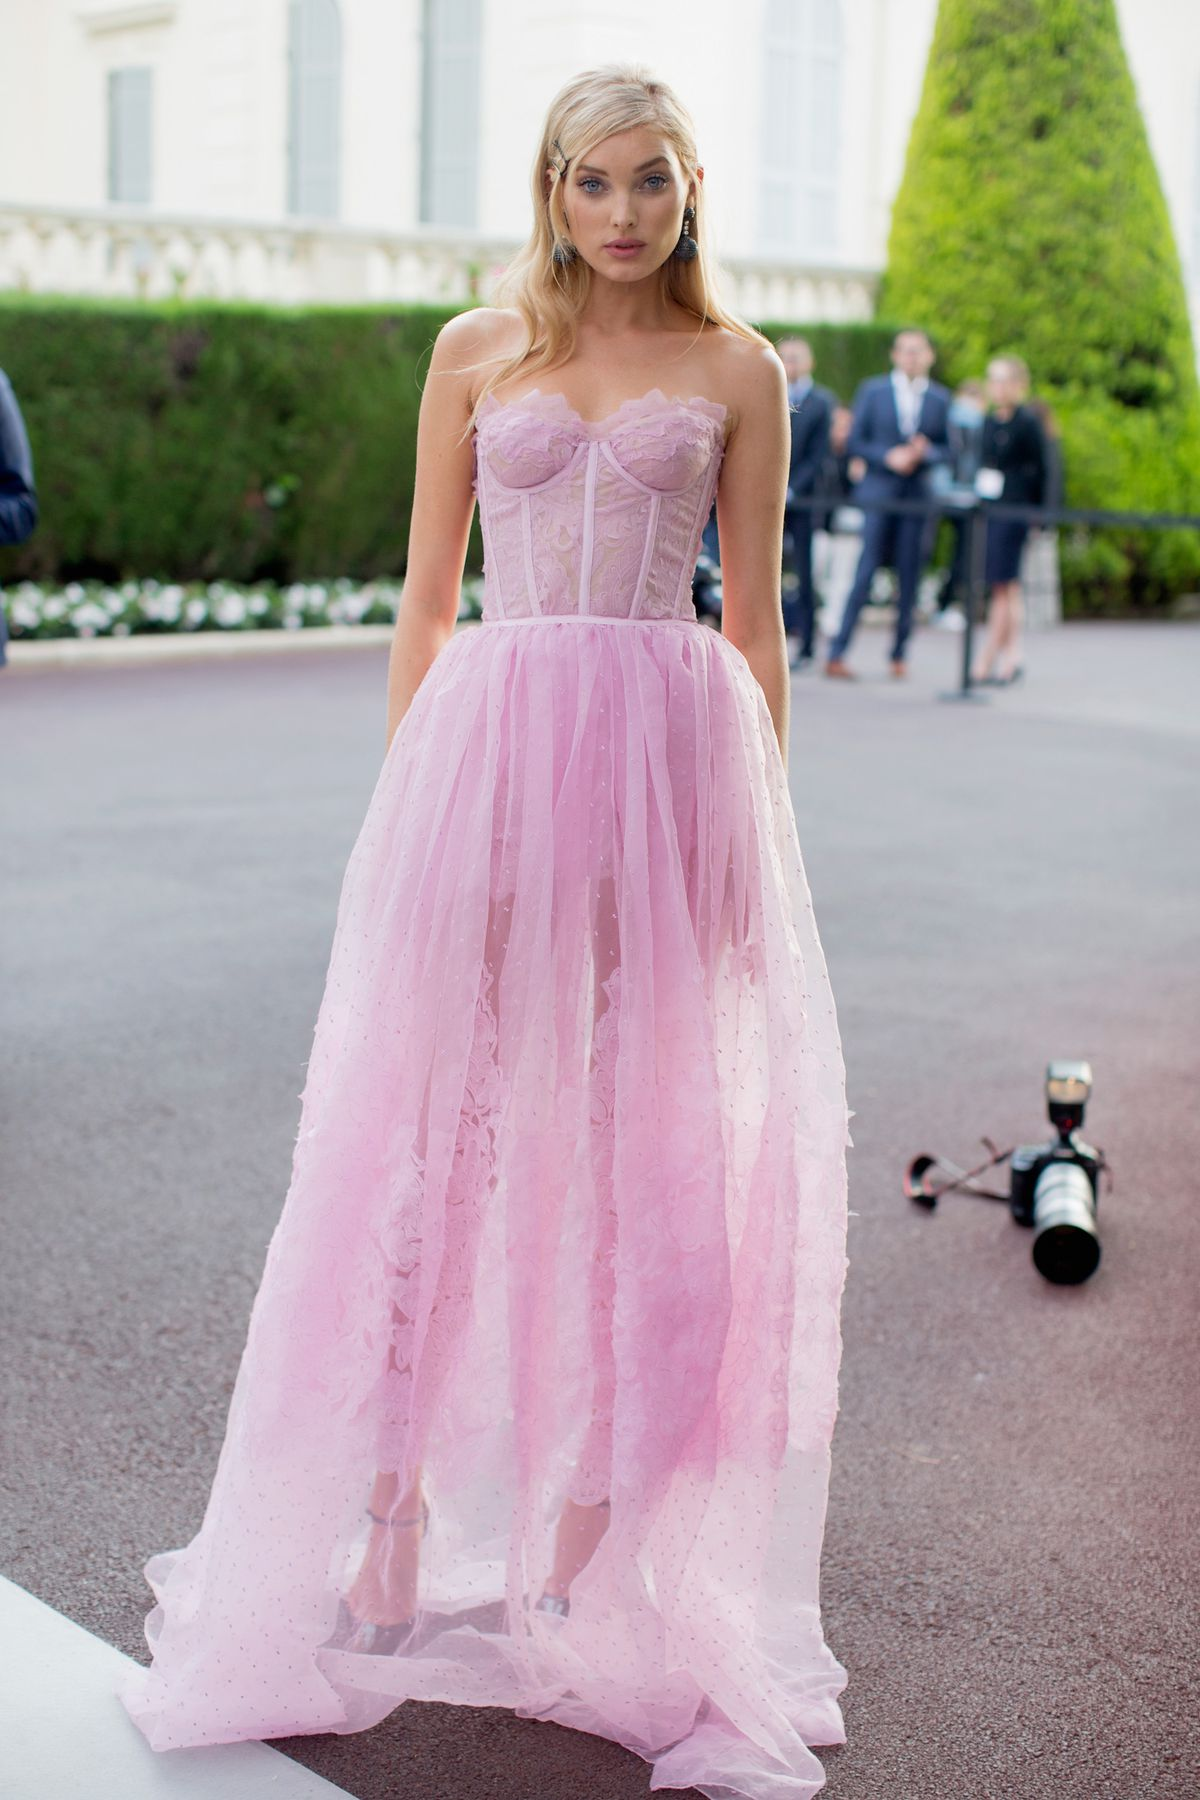 Style Inspiration: Elsa Hosk at the Cannes Film Festival